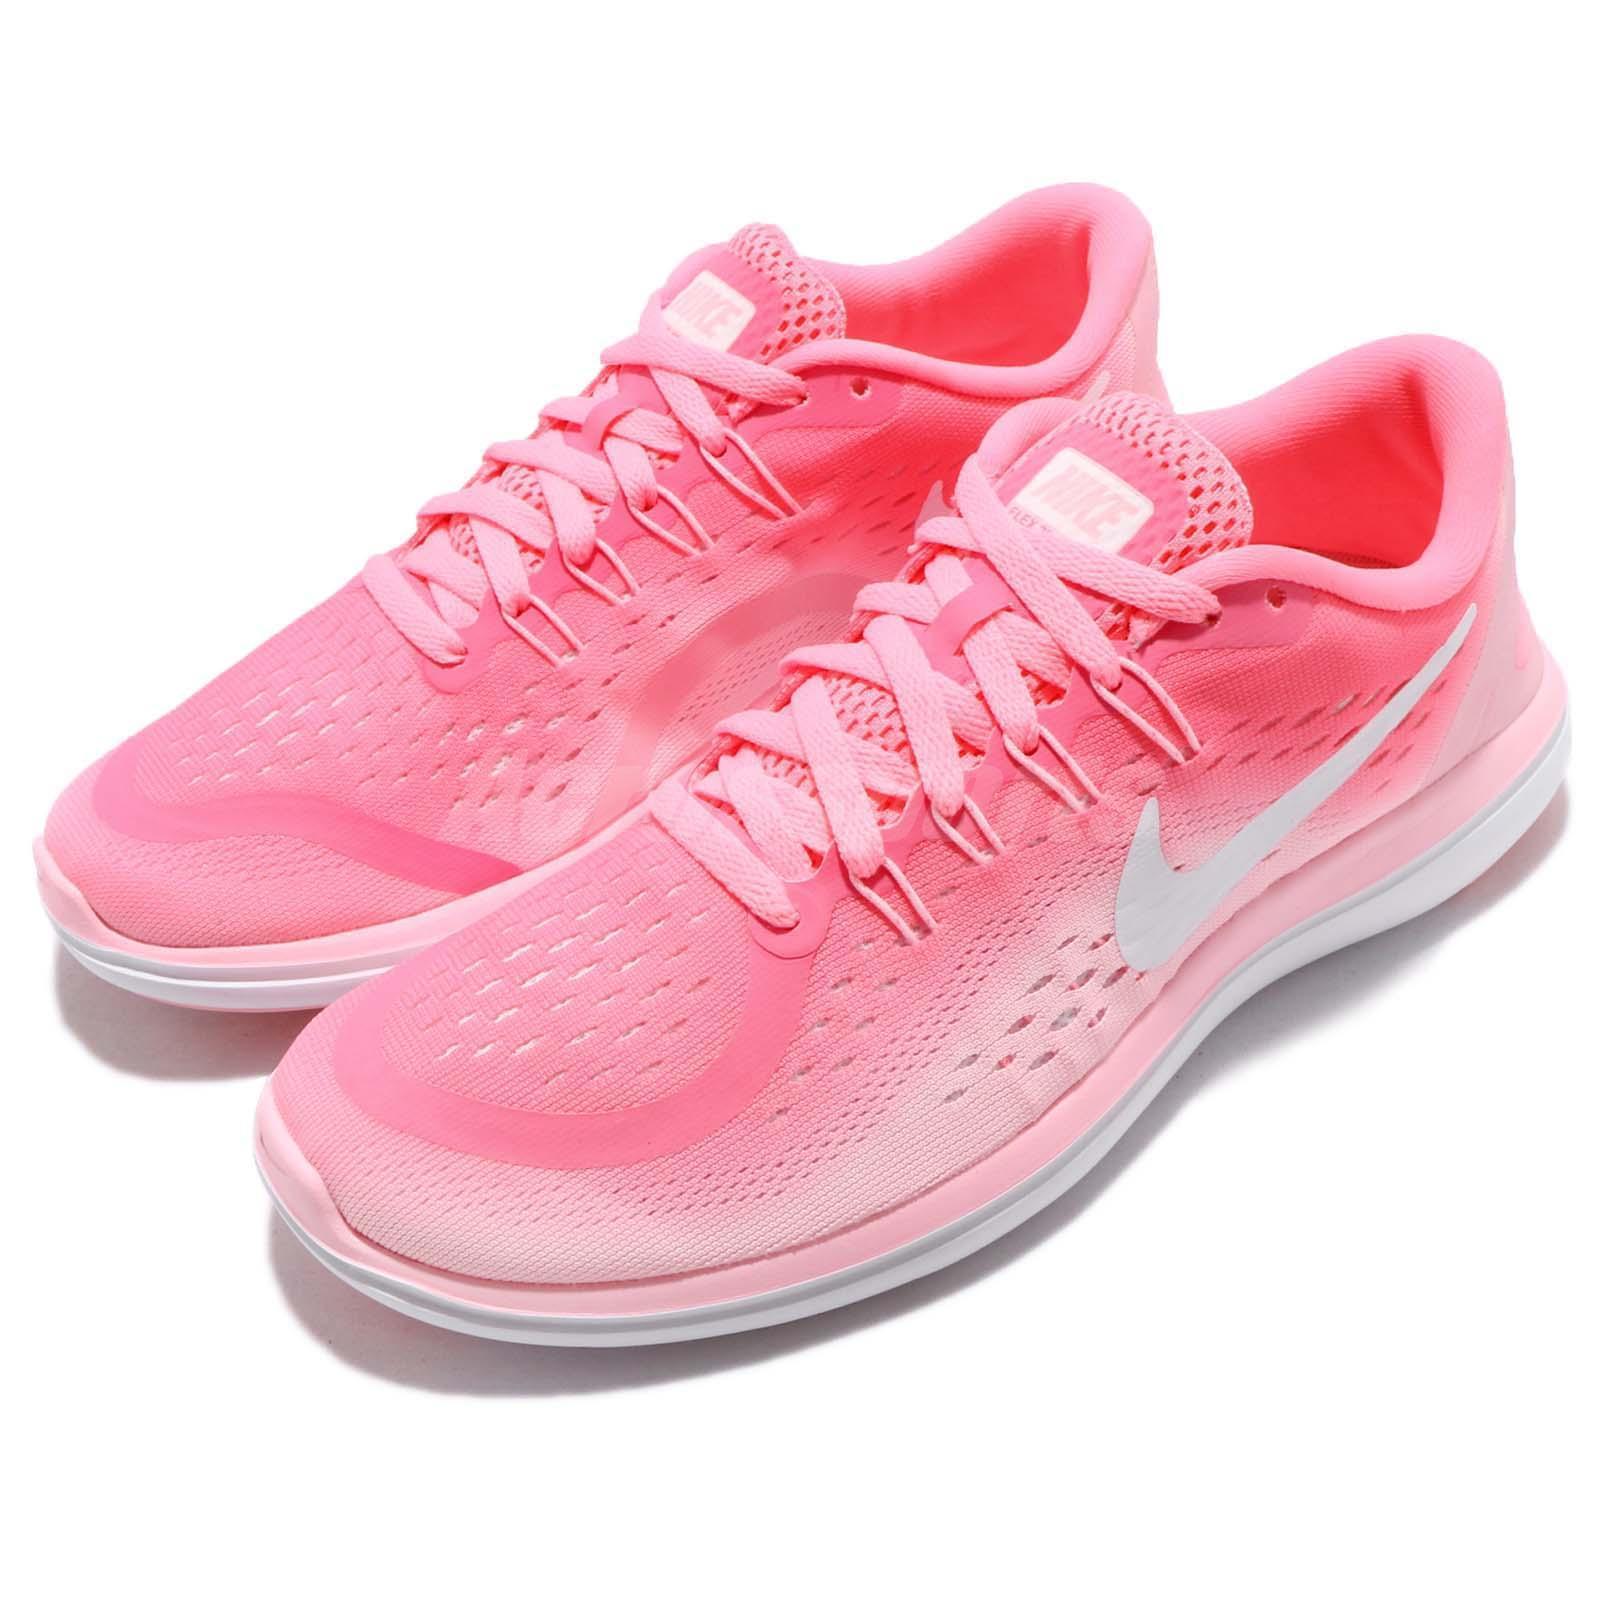 f17089fd08e Details about Wmns Nike Flex 2017 RN Pink Sunset Pulse Women Running Shoes  Sneakers 898476-601